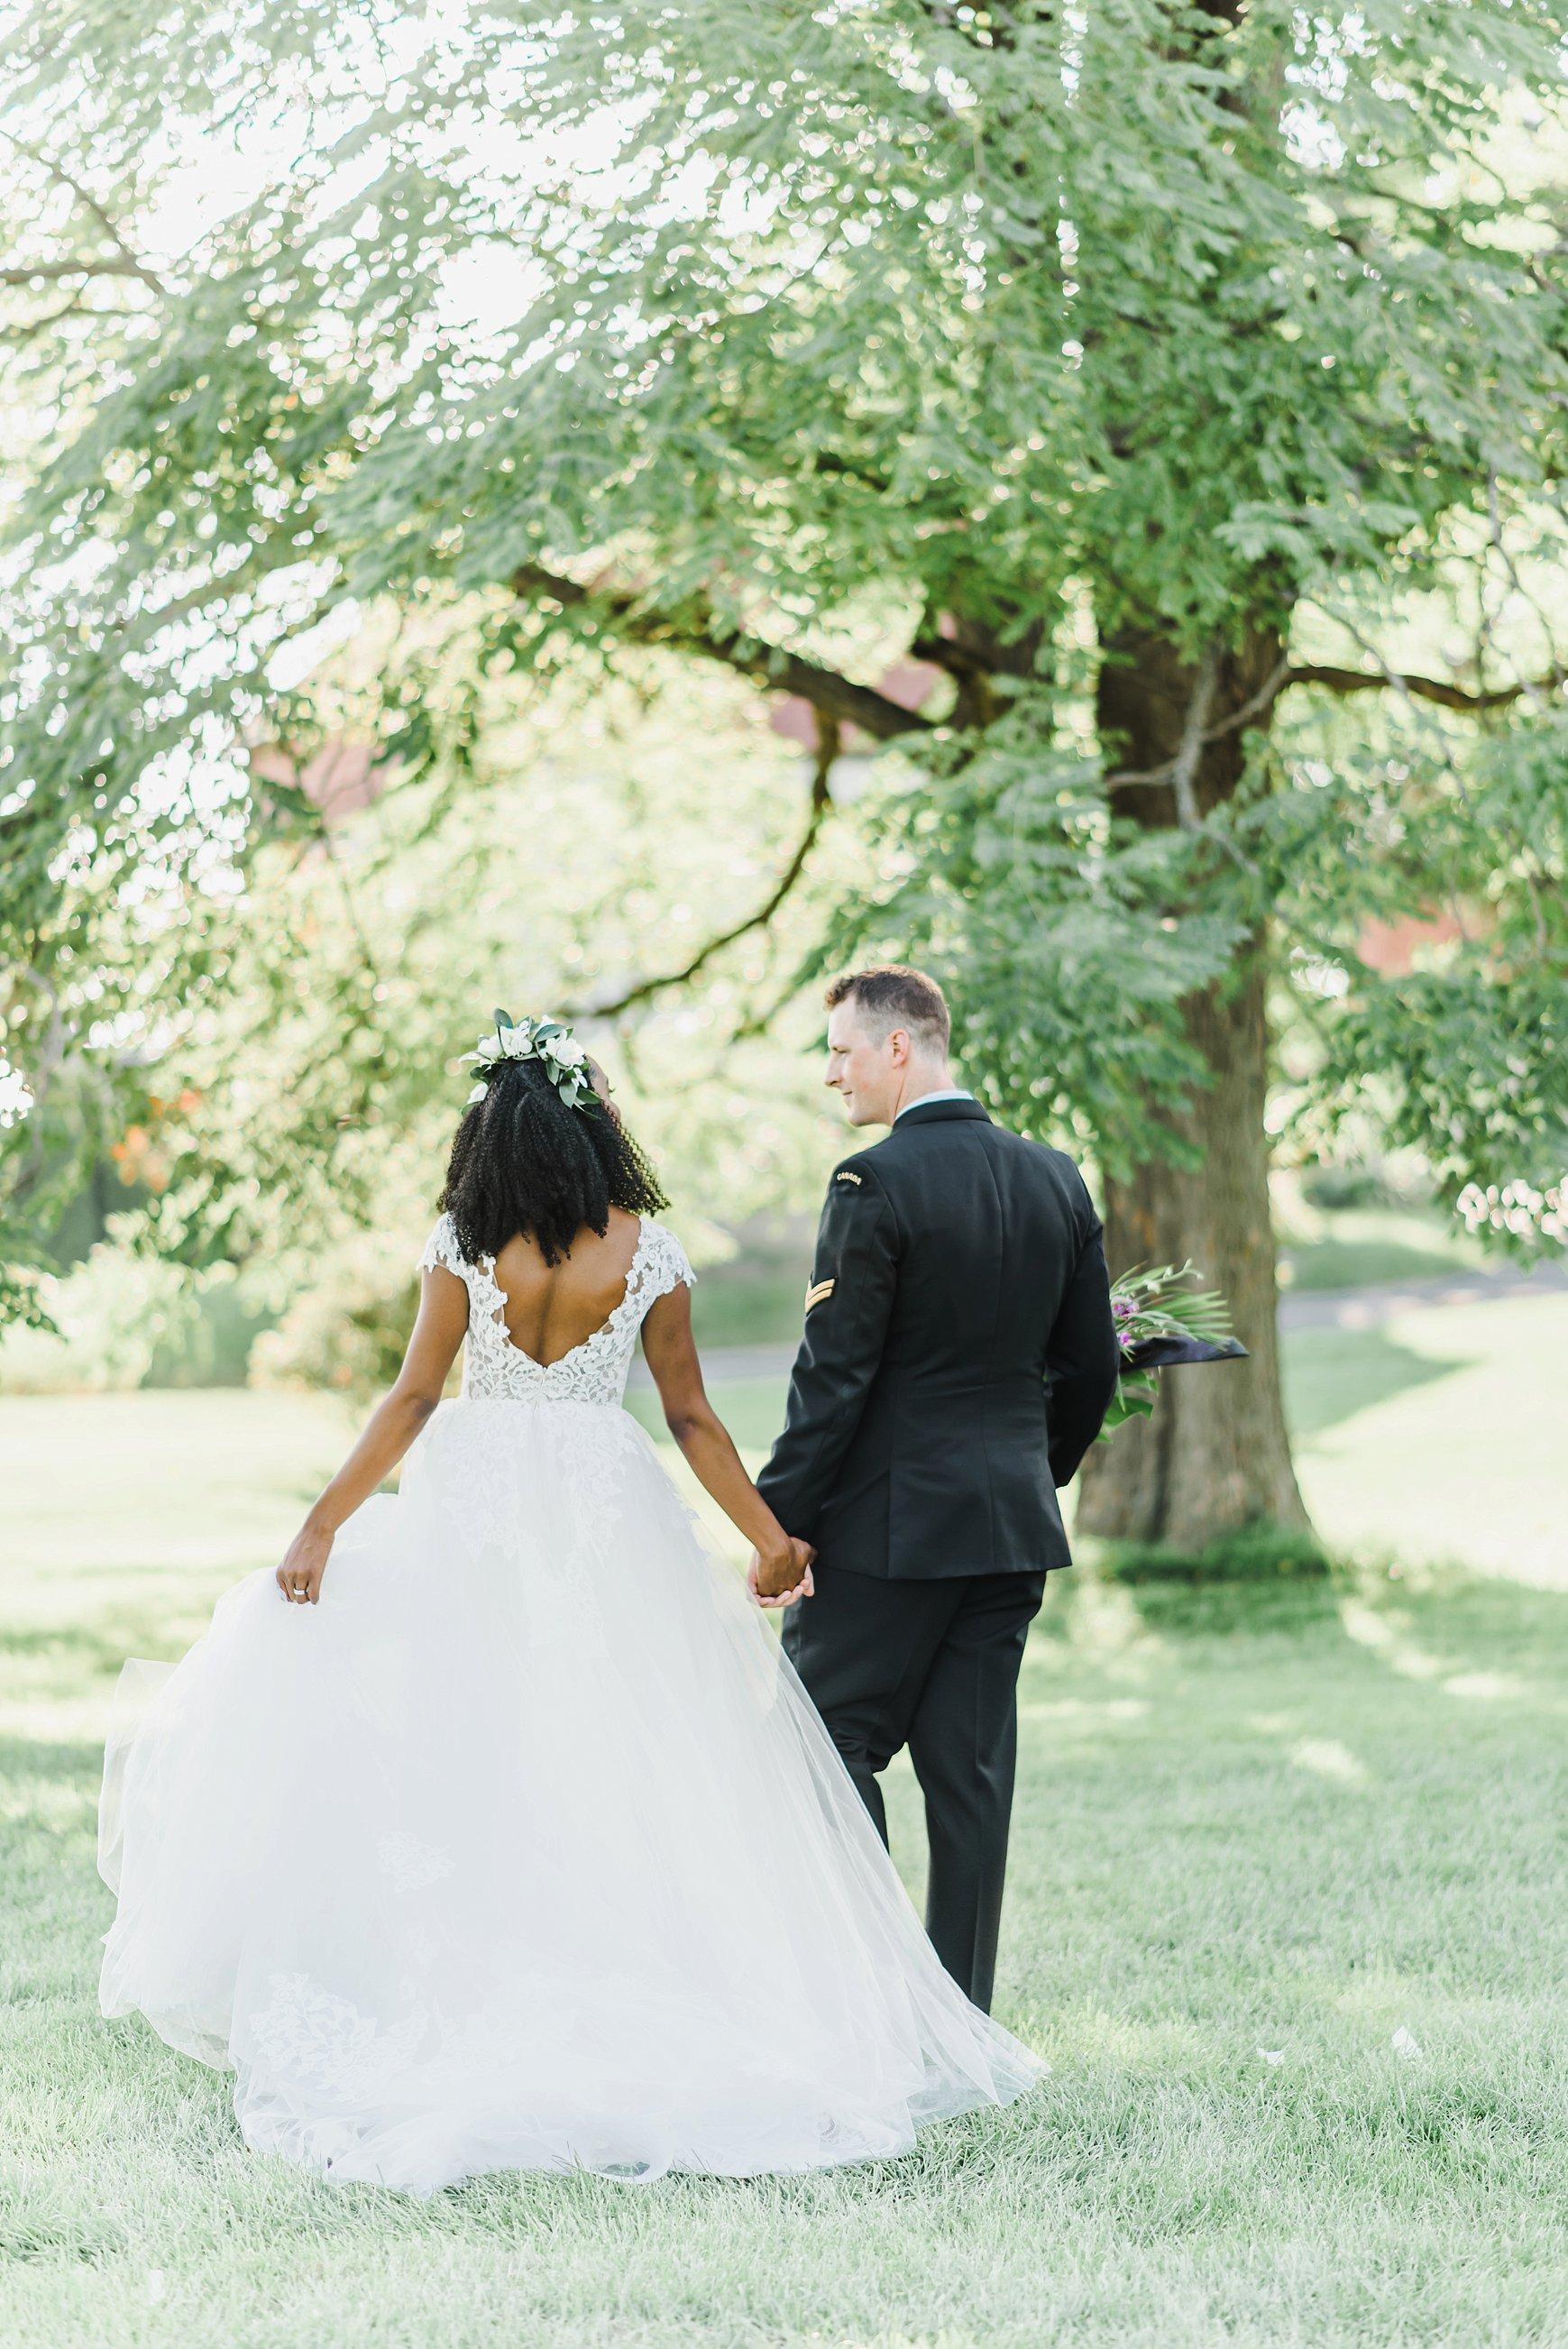 light airy indie fine art ottawa wedding photographer | Ali and Batoul Photography_0993.jpg